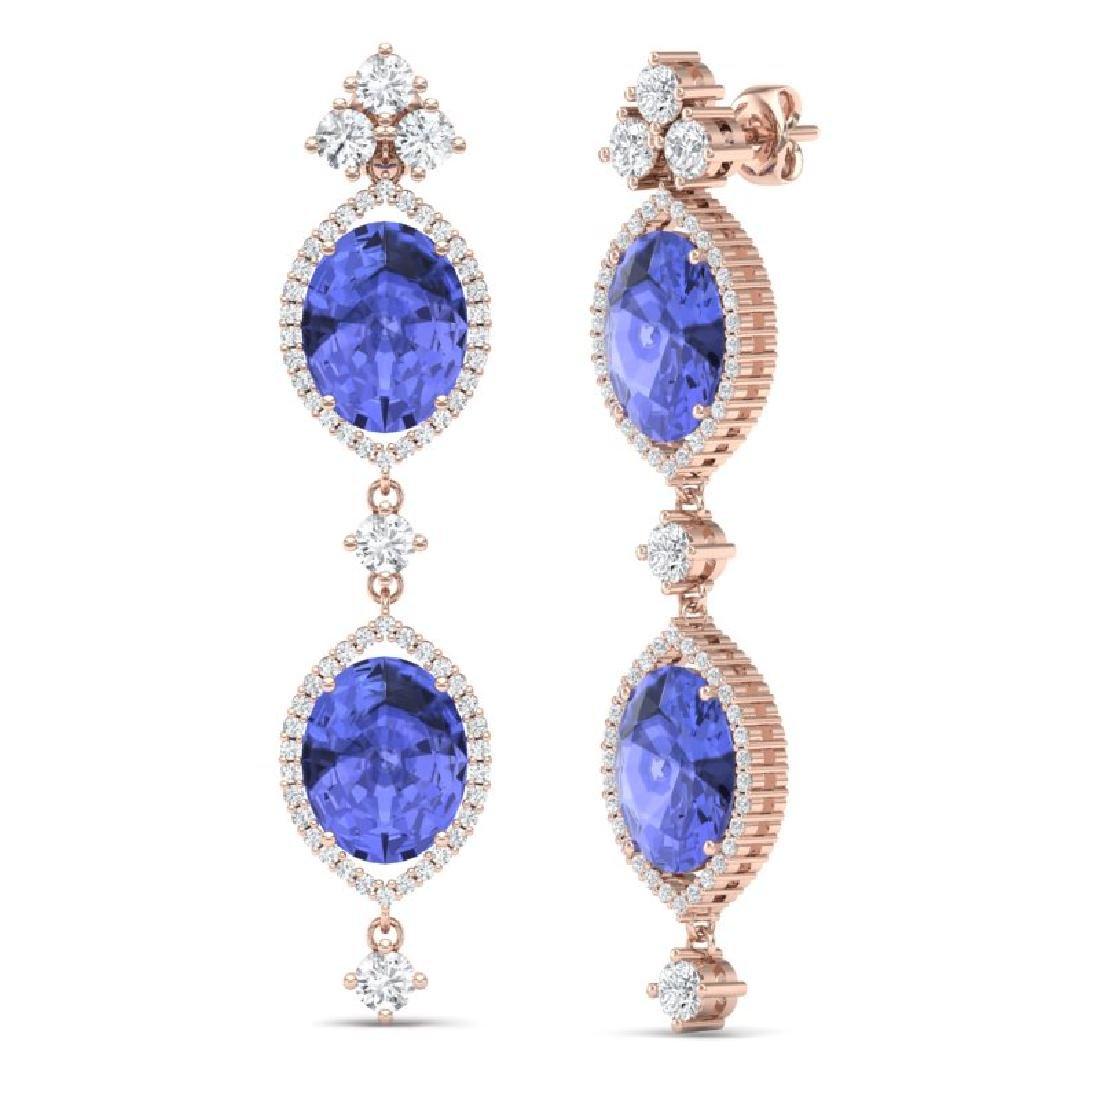 16.21 CTW Royalty Tanzanite & VS Diamond Earrings 18K - 3